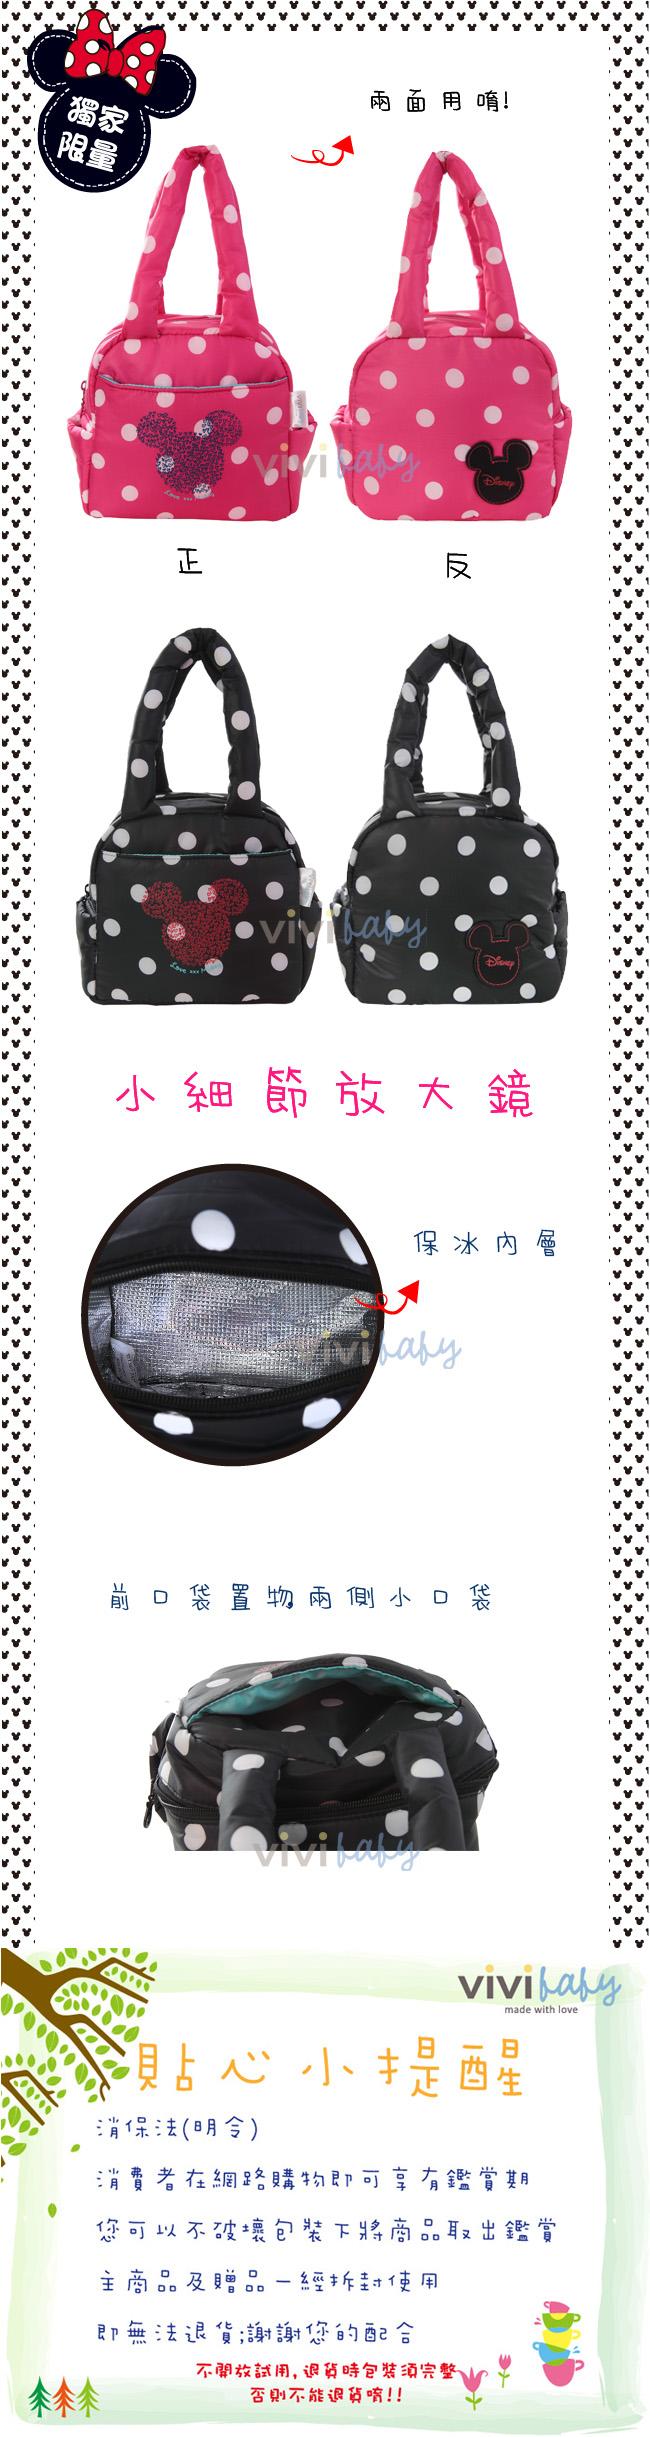 disney-coolbag-info01